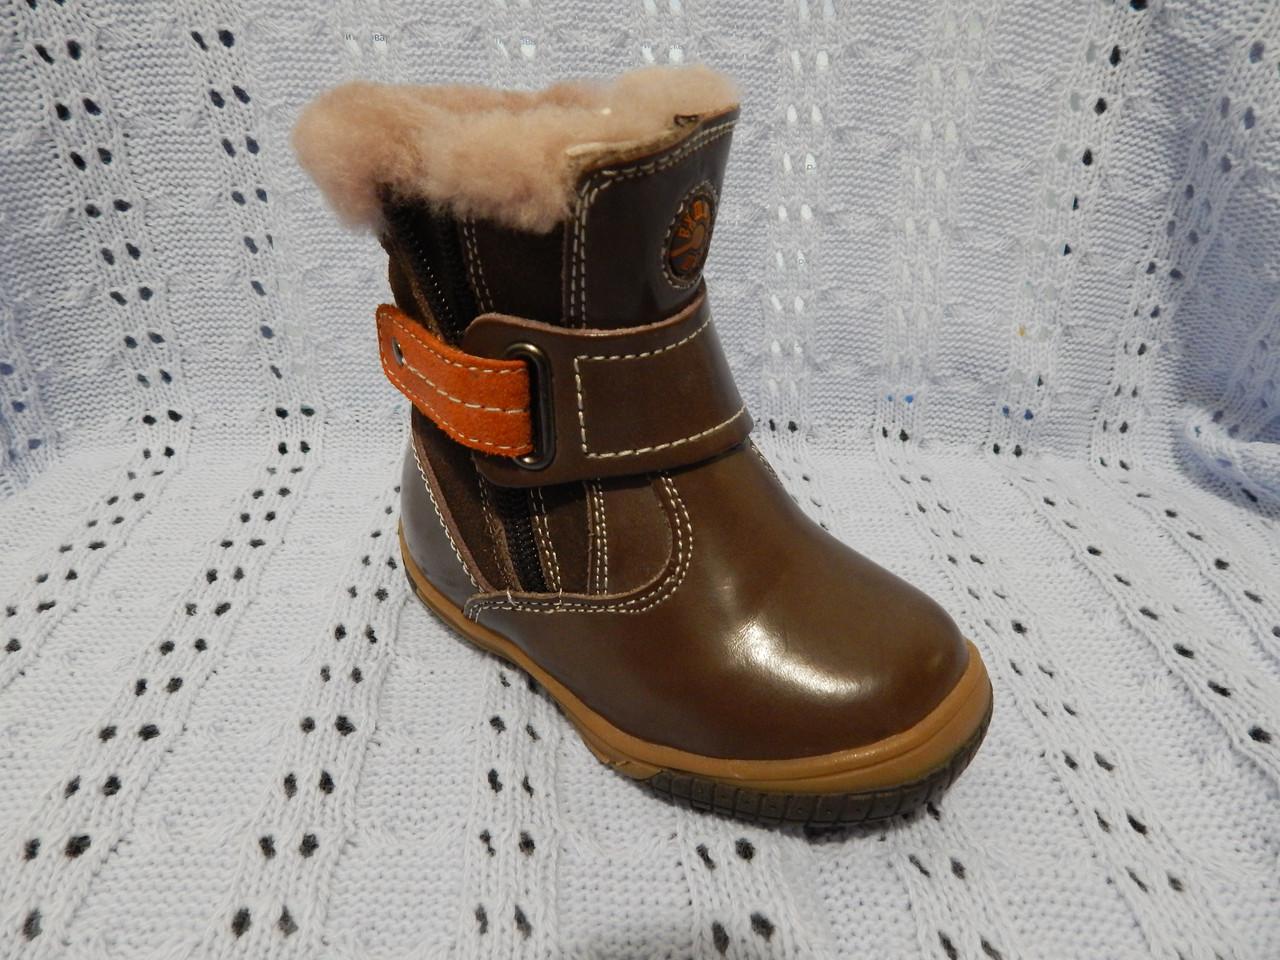 Сапоги зимние  кожаные на овчине ТМ Шалунишка